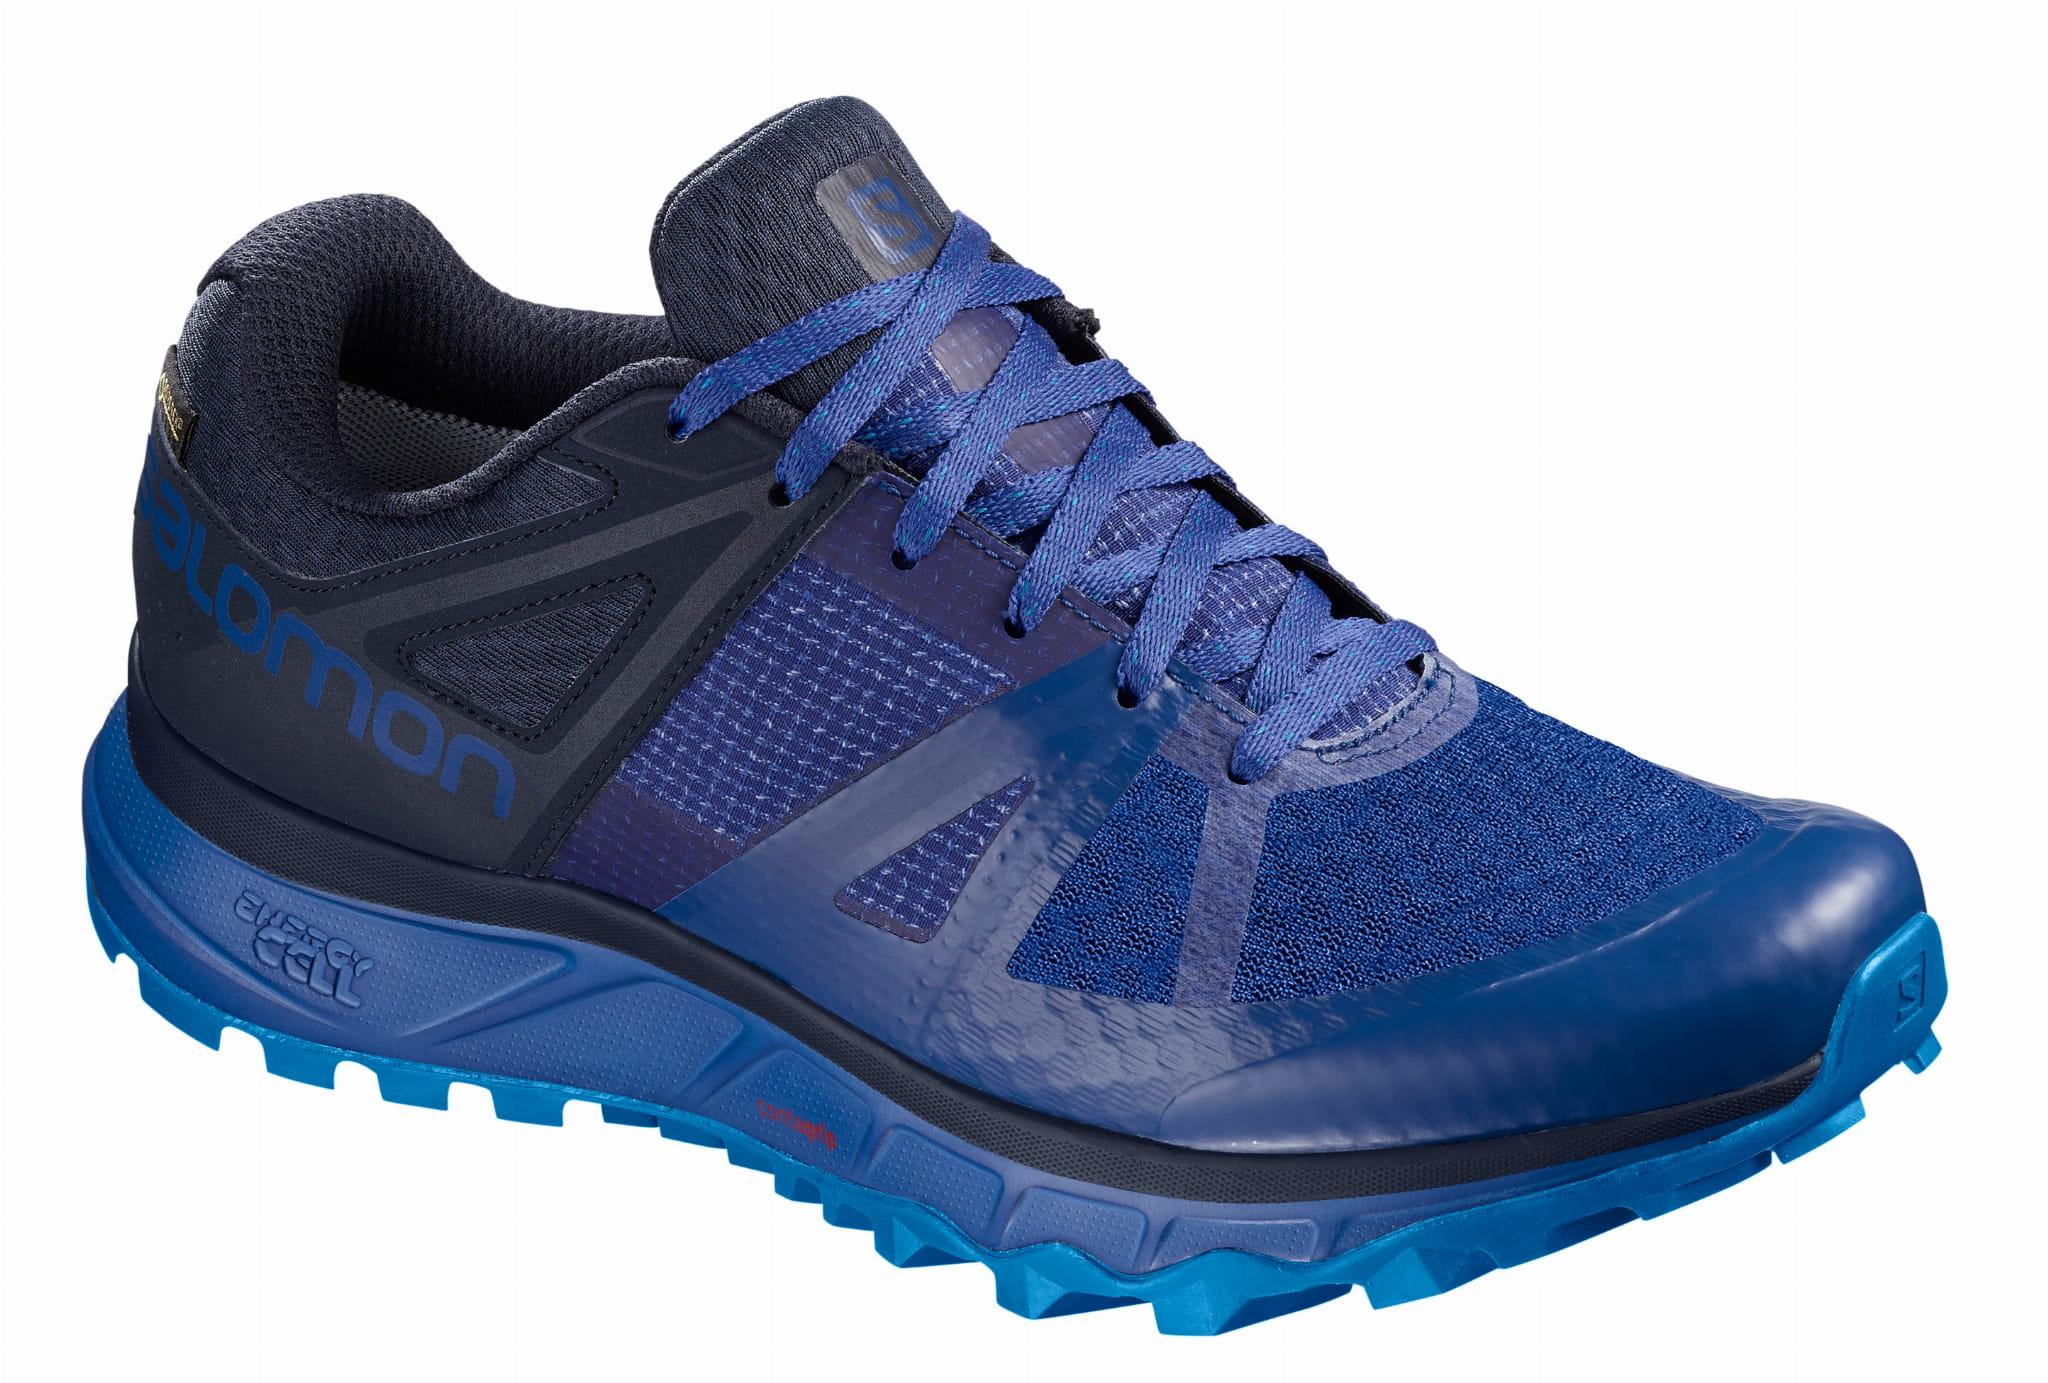 Buty Salomon Trailster GTX Maz Blue 404883